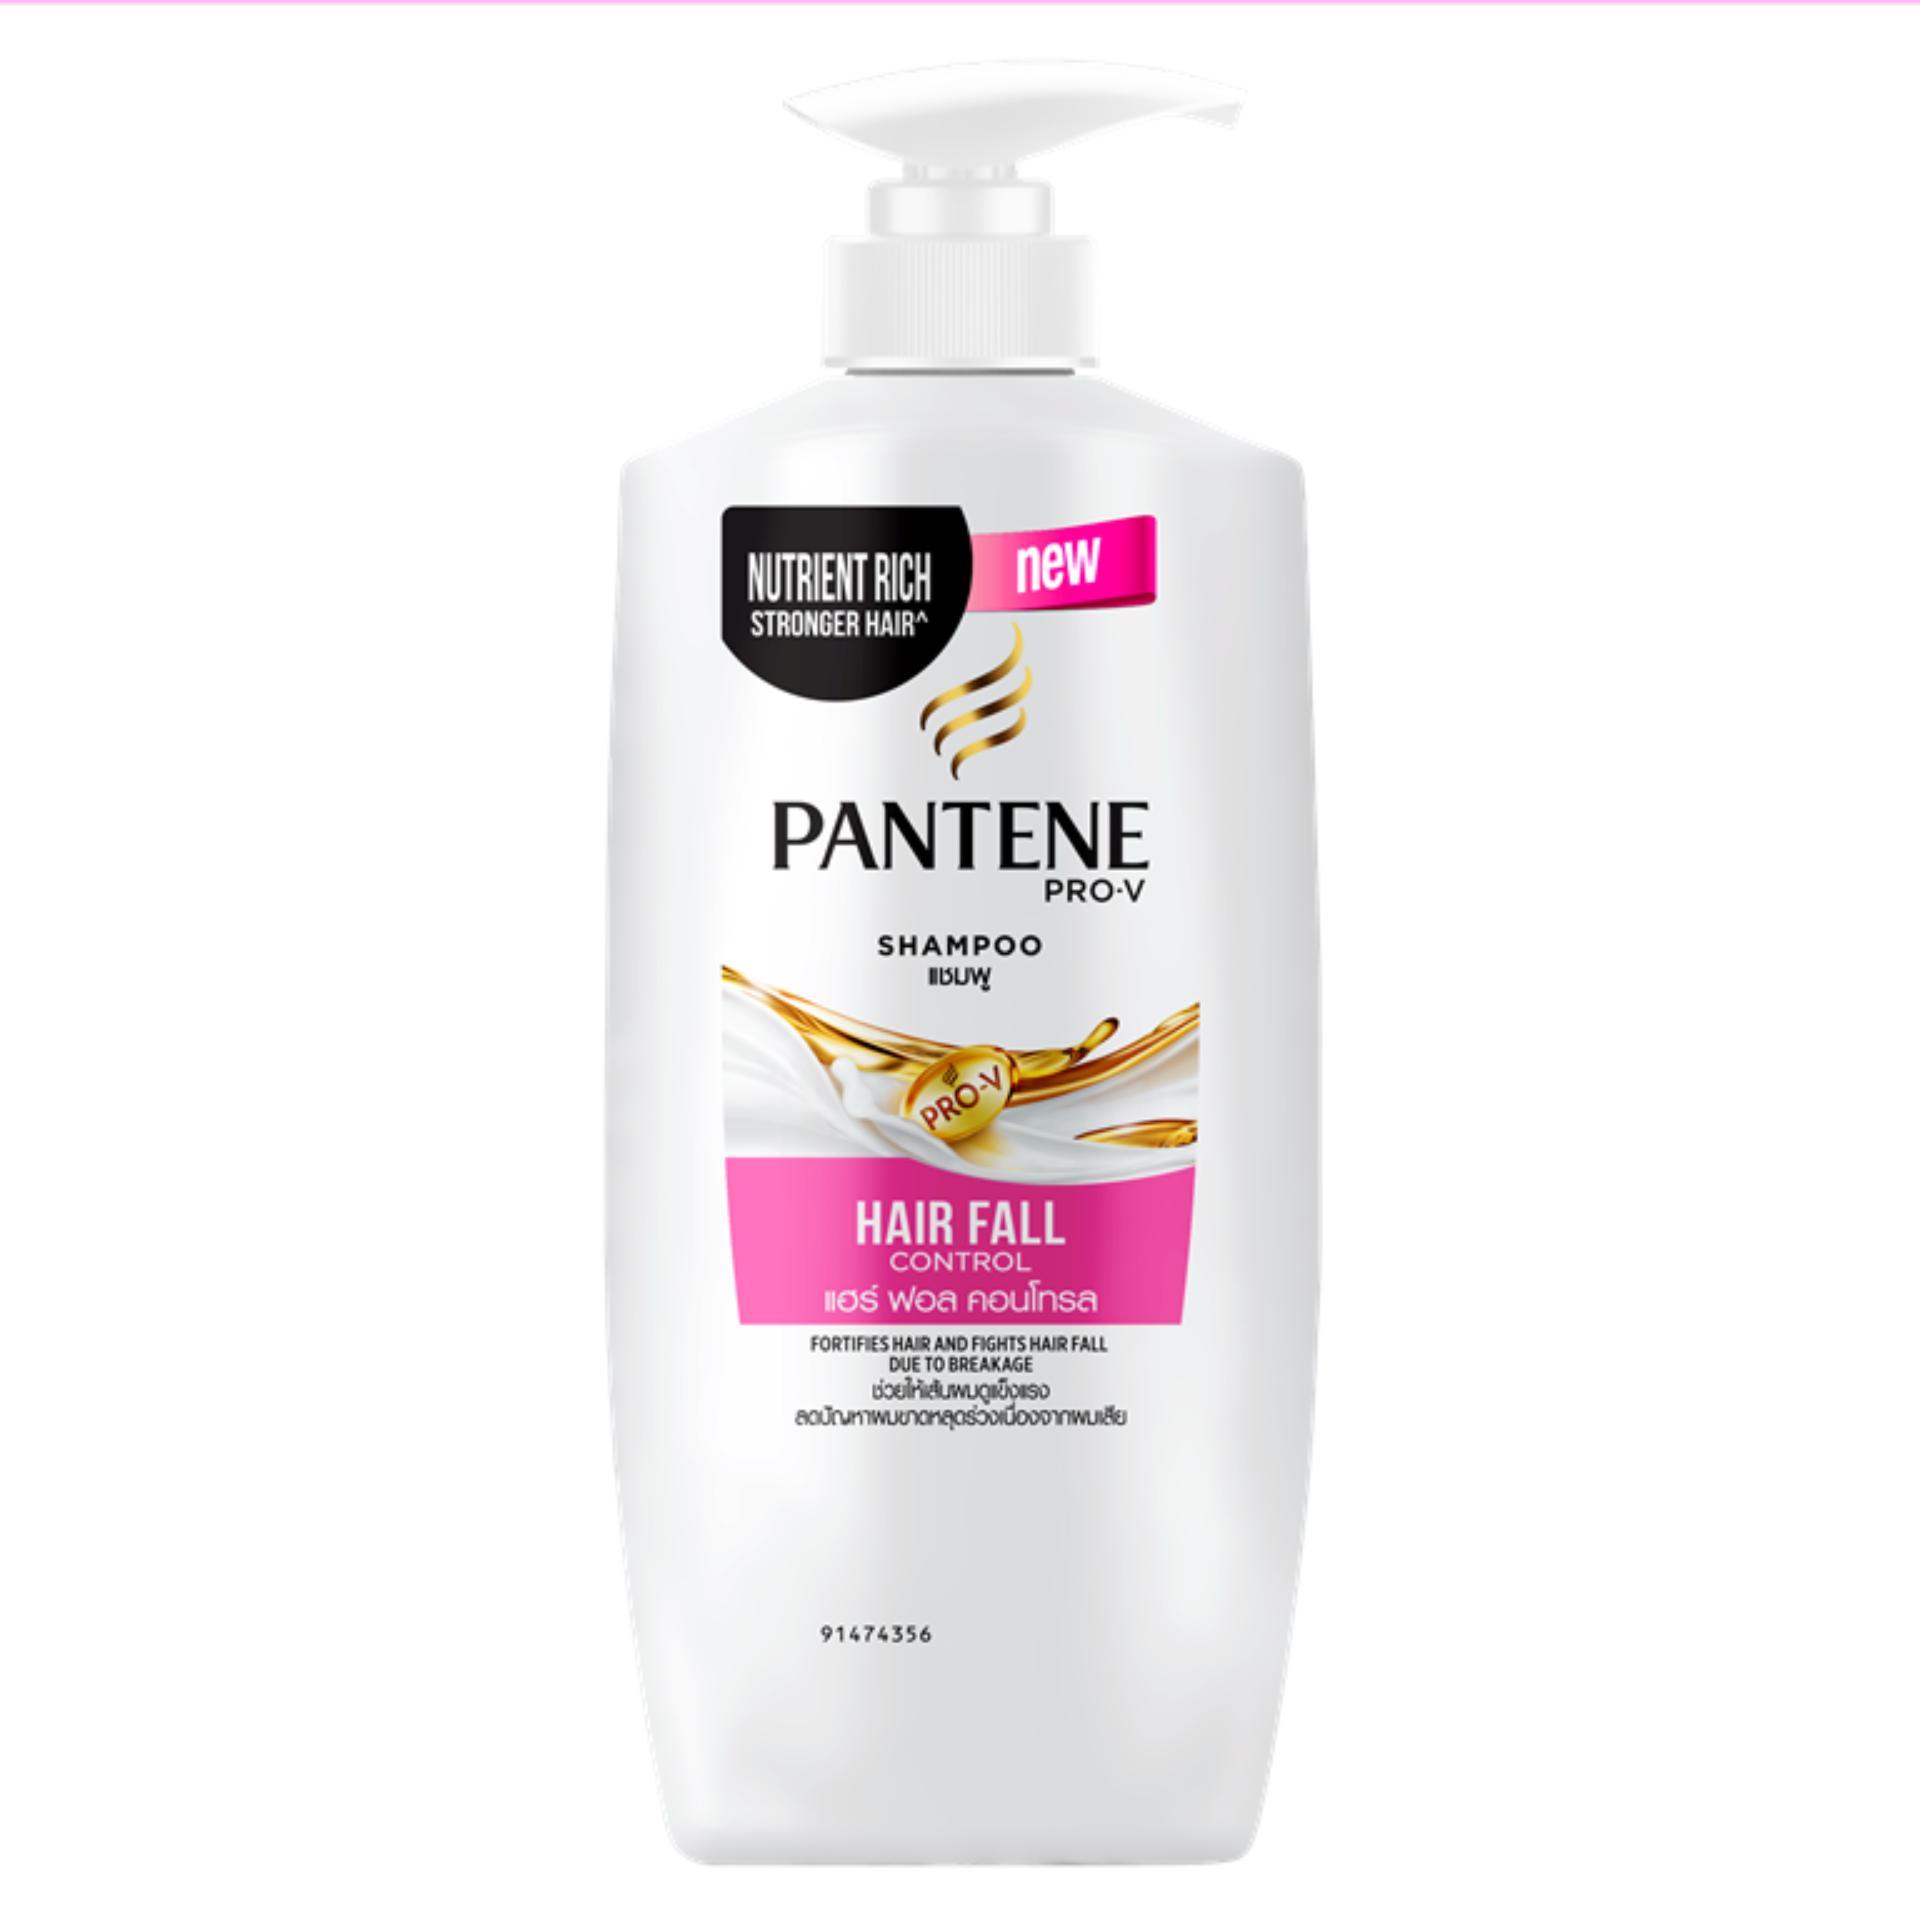 Pantene Philippines: Pantene price list - Shampoo & Hair Conditioner for sale   Lazada